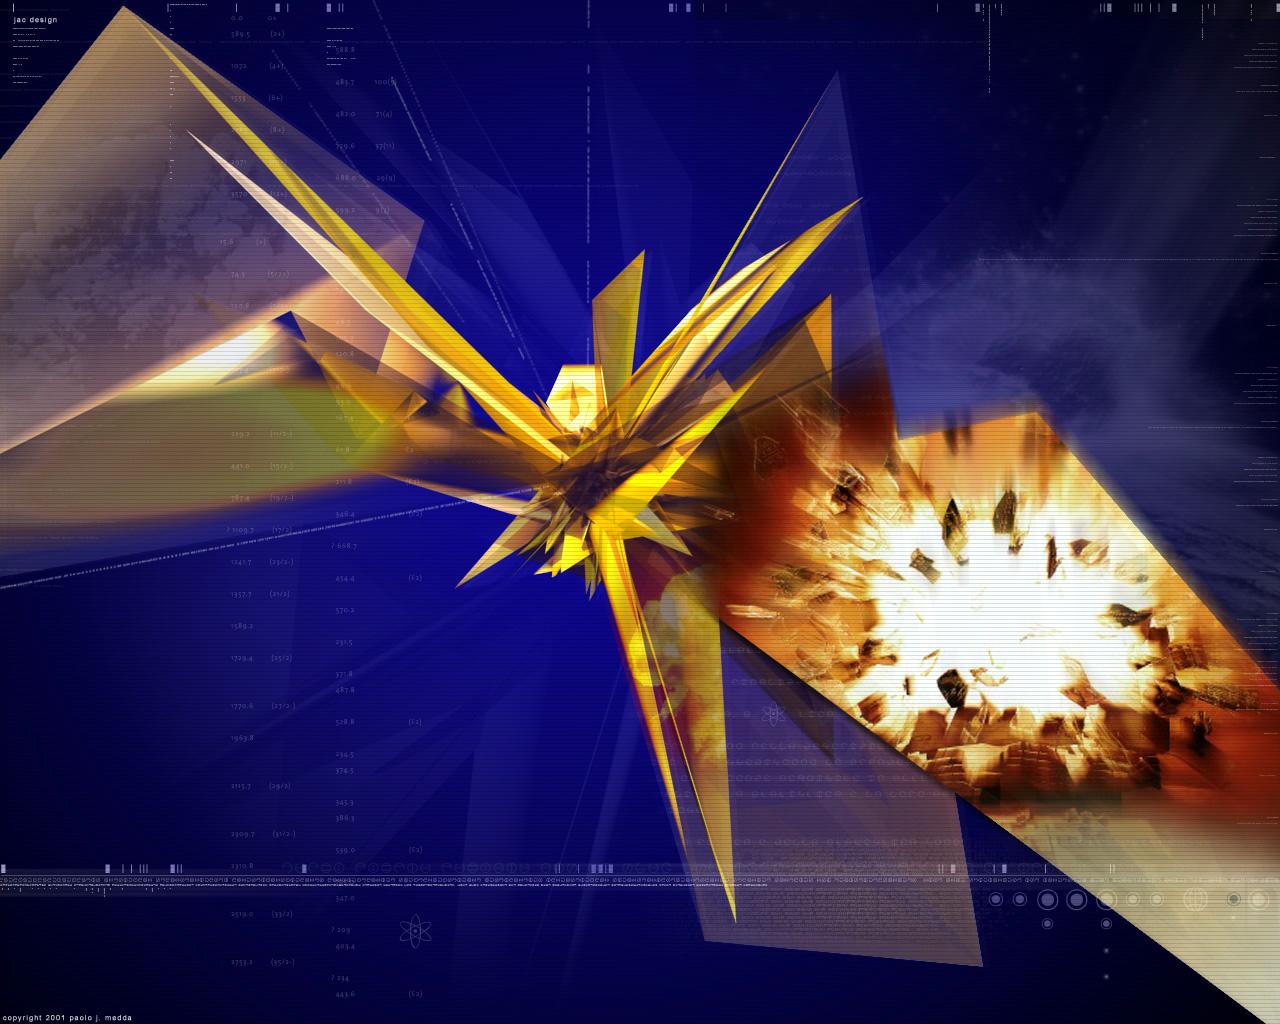 http://3.bp.blogspot.com/-SrL_QaJv6lk/TlyaIM2lcyI/AAAAAAAAACs/wFCSD97On6k/s1600/chromodynamic_bomb_12x10.jpg